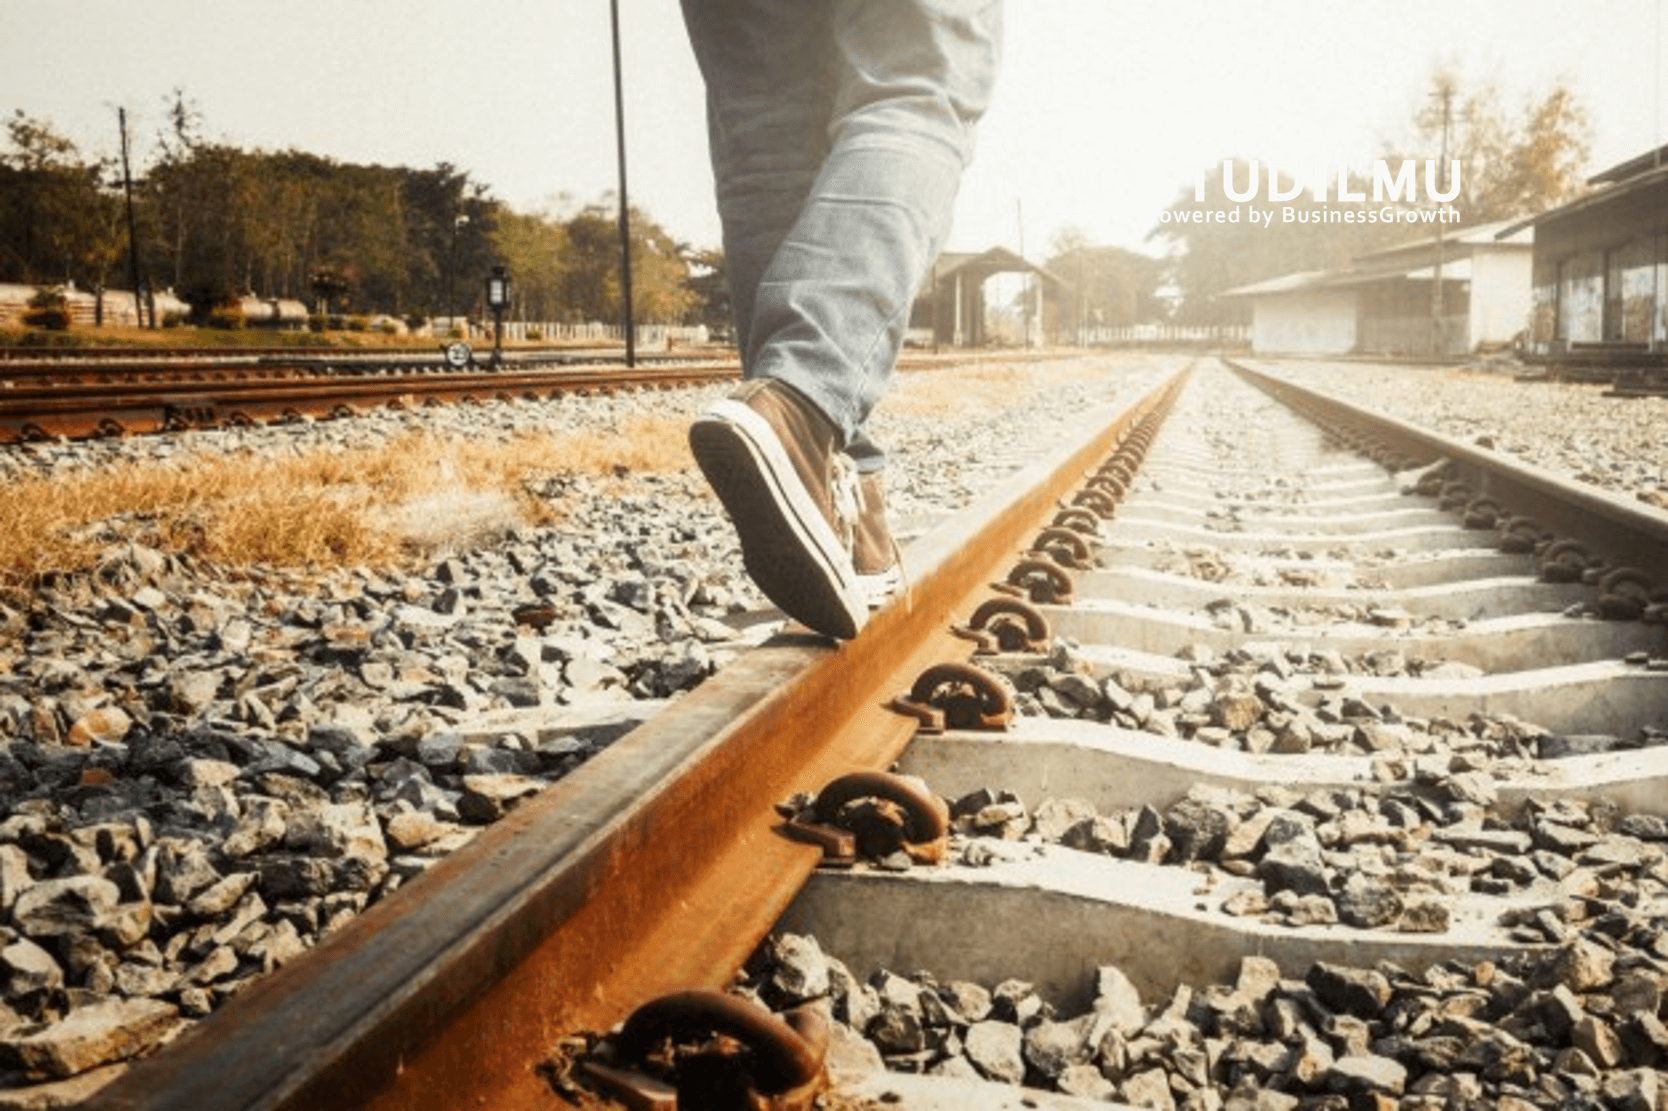 STUDILMU Career Advice - 10 Tanda Anda Berada di Jalan yang Benar dalam Kehidupan